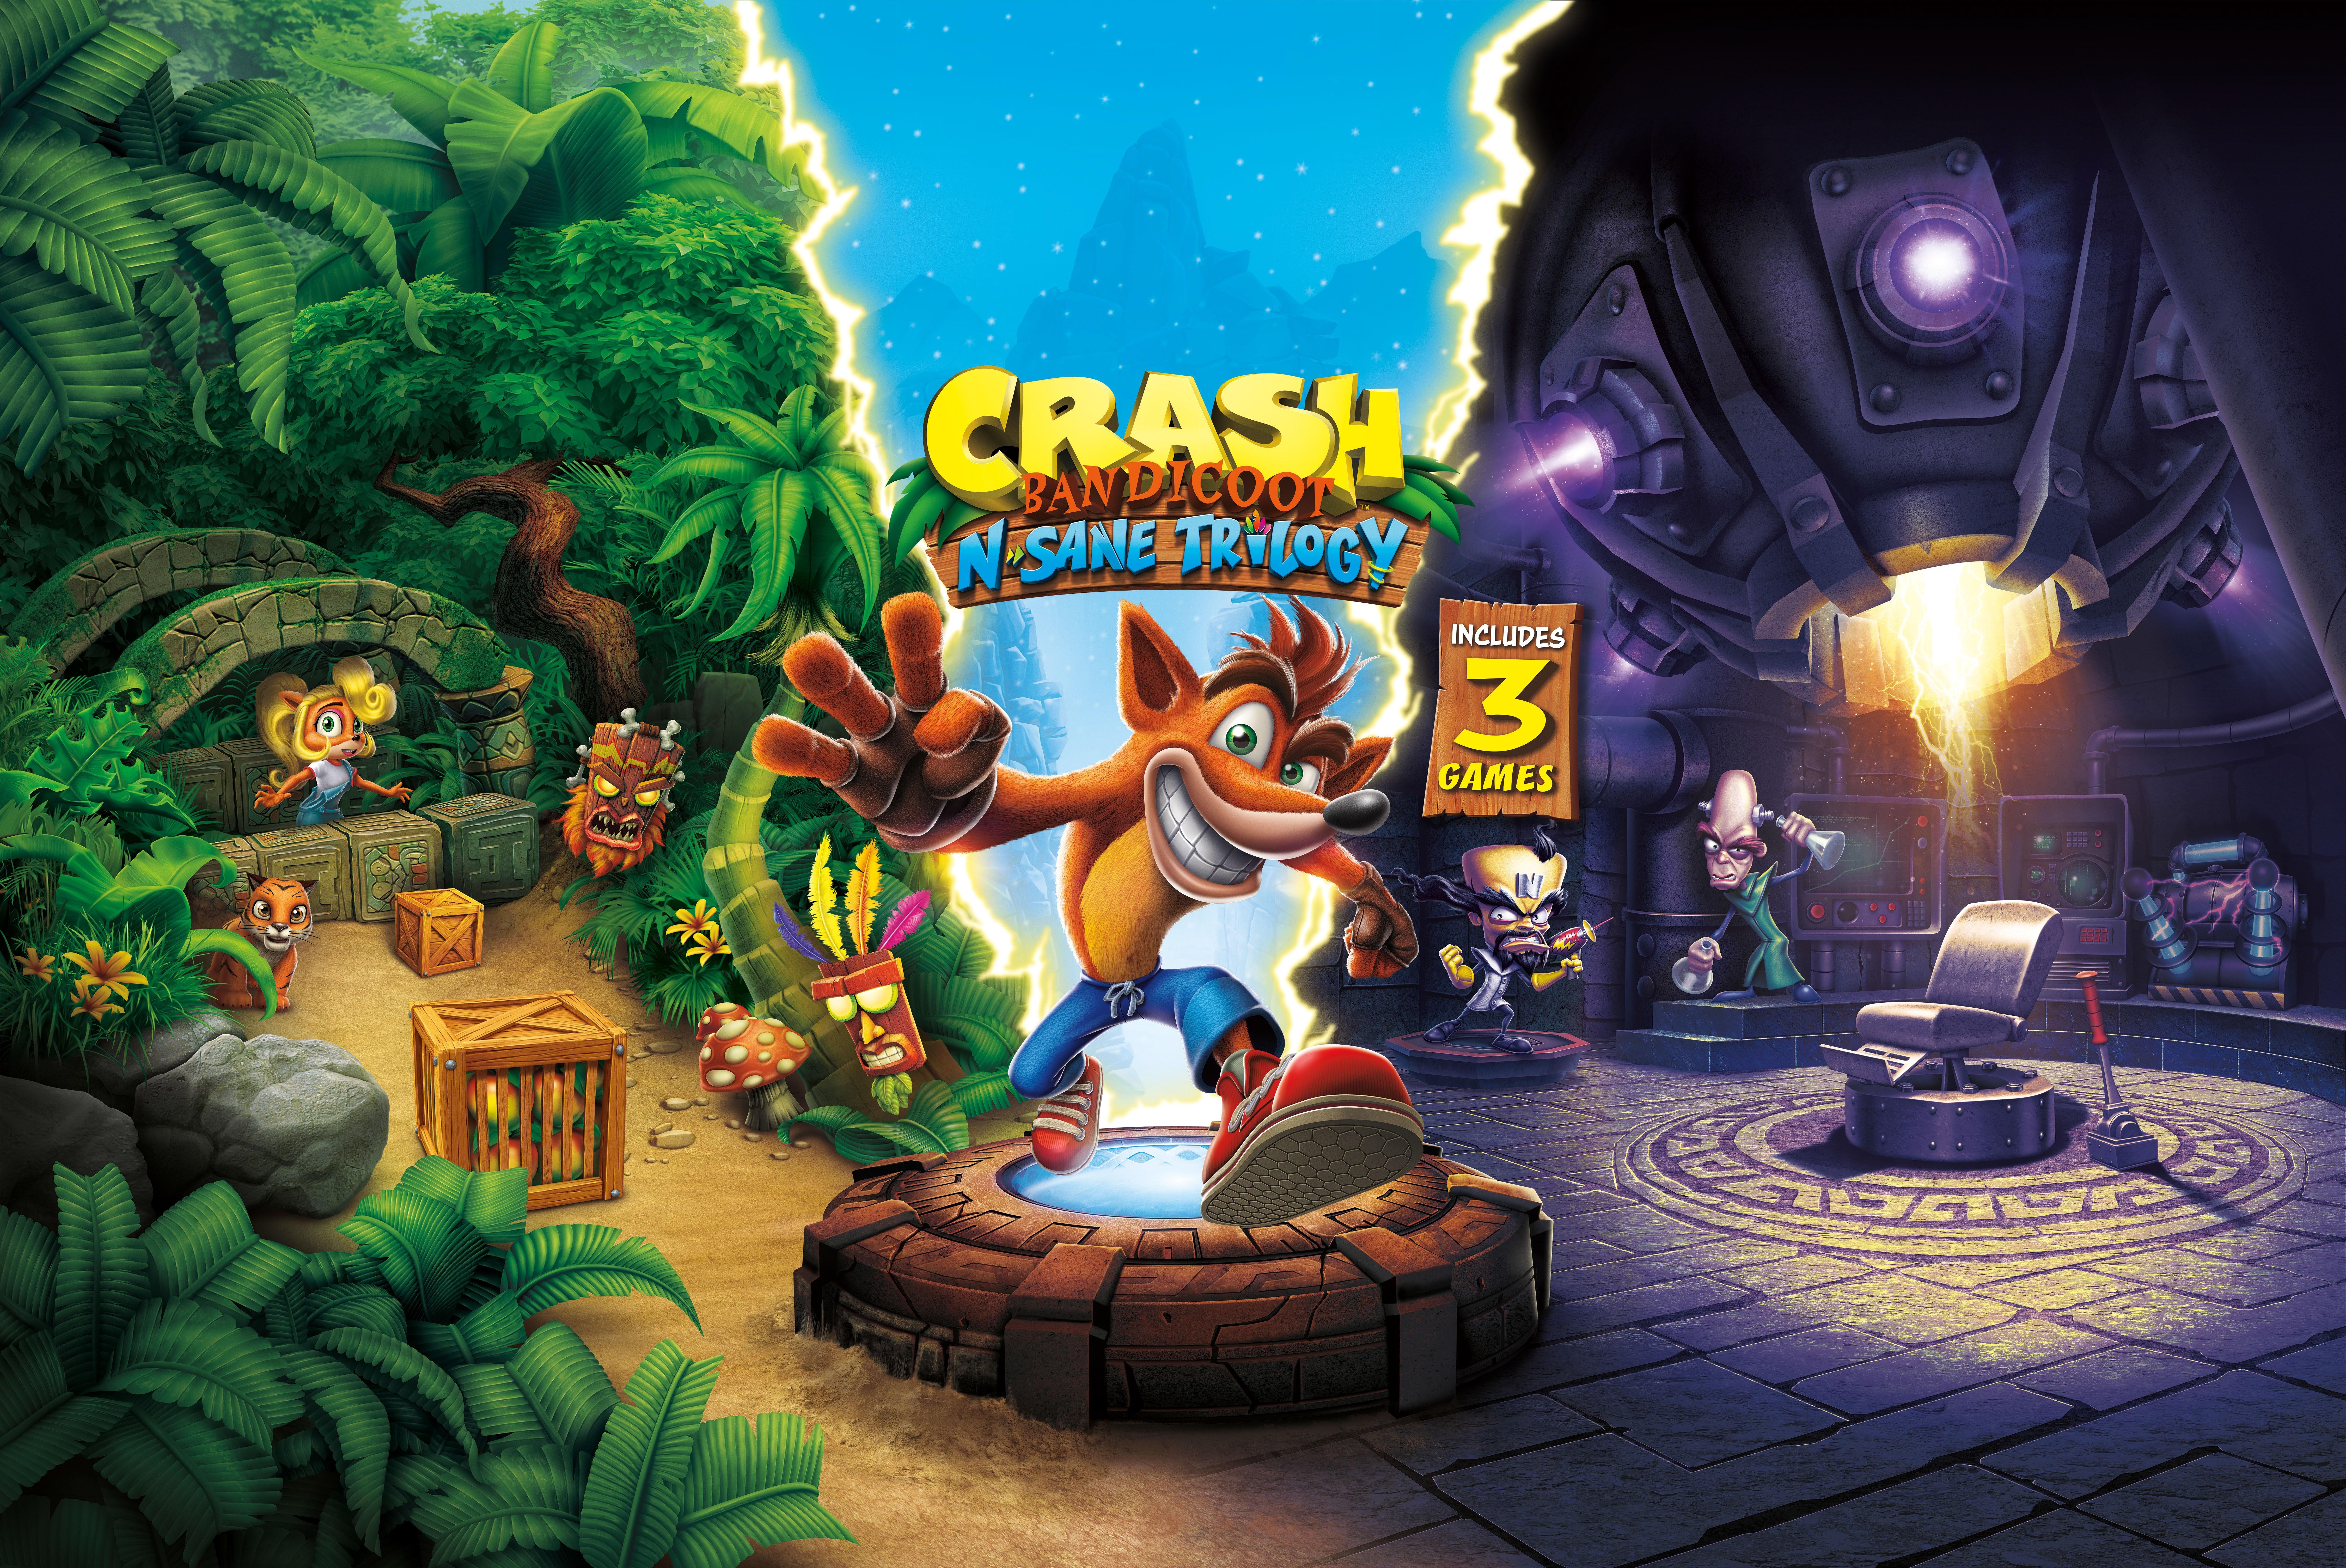 Crash Bandicoot On Nintendo Switch Docked Mode Is 720p And